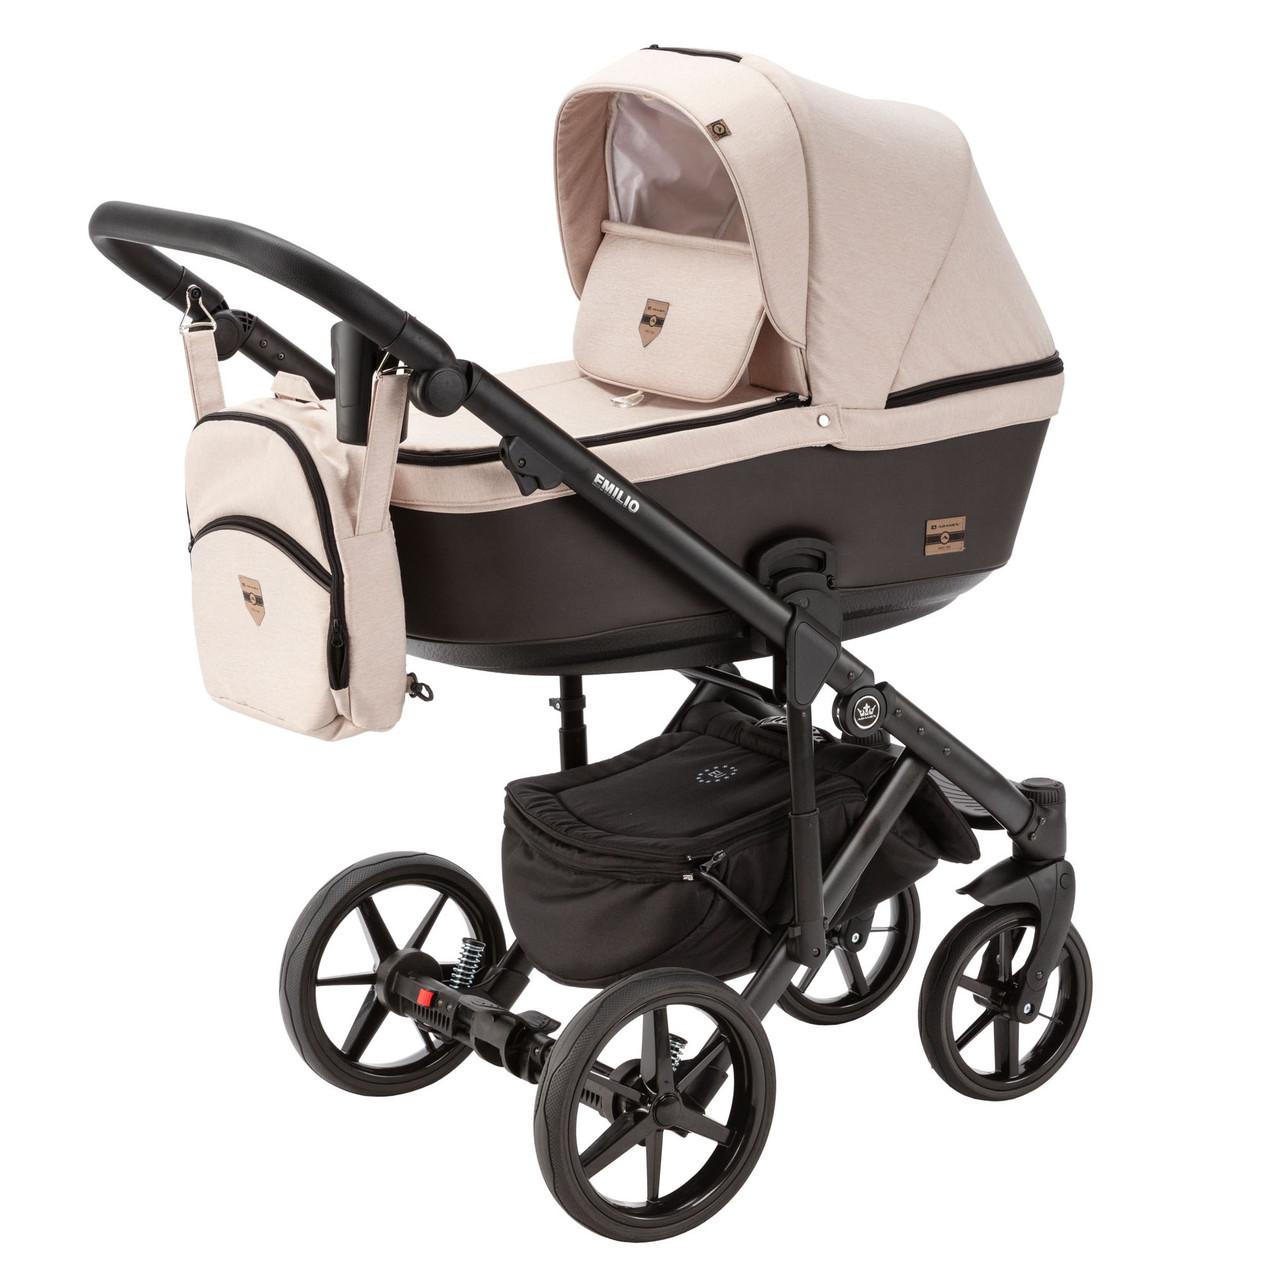 Дитяча універсальна коляска 2 в 1 Adamex Emilio EM-267